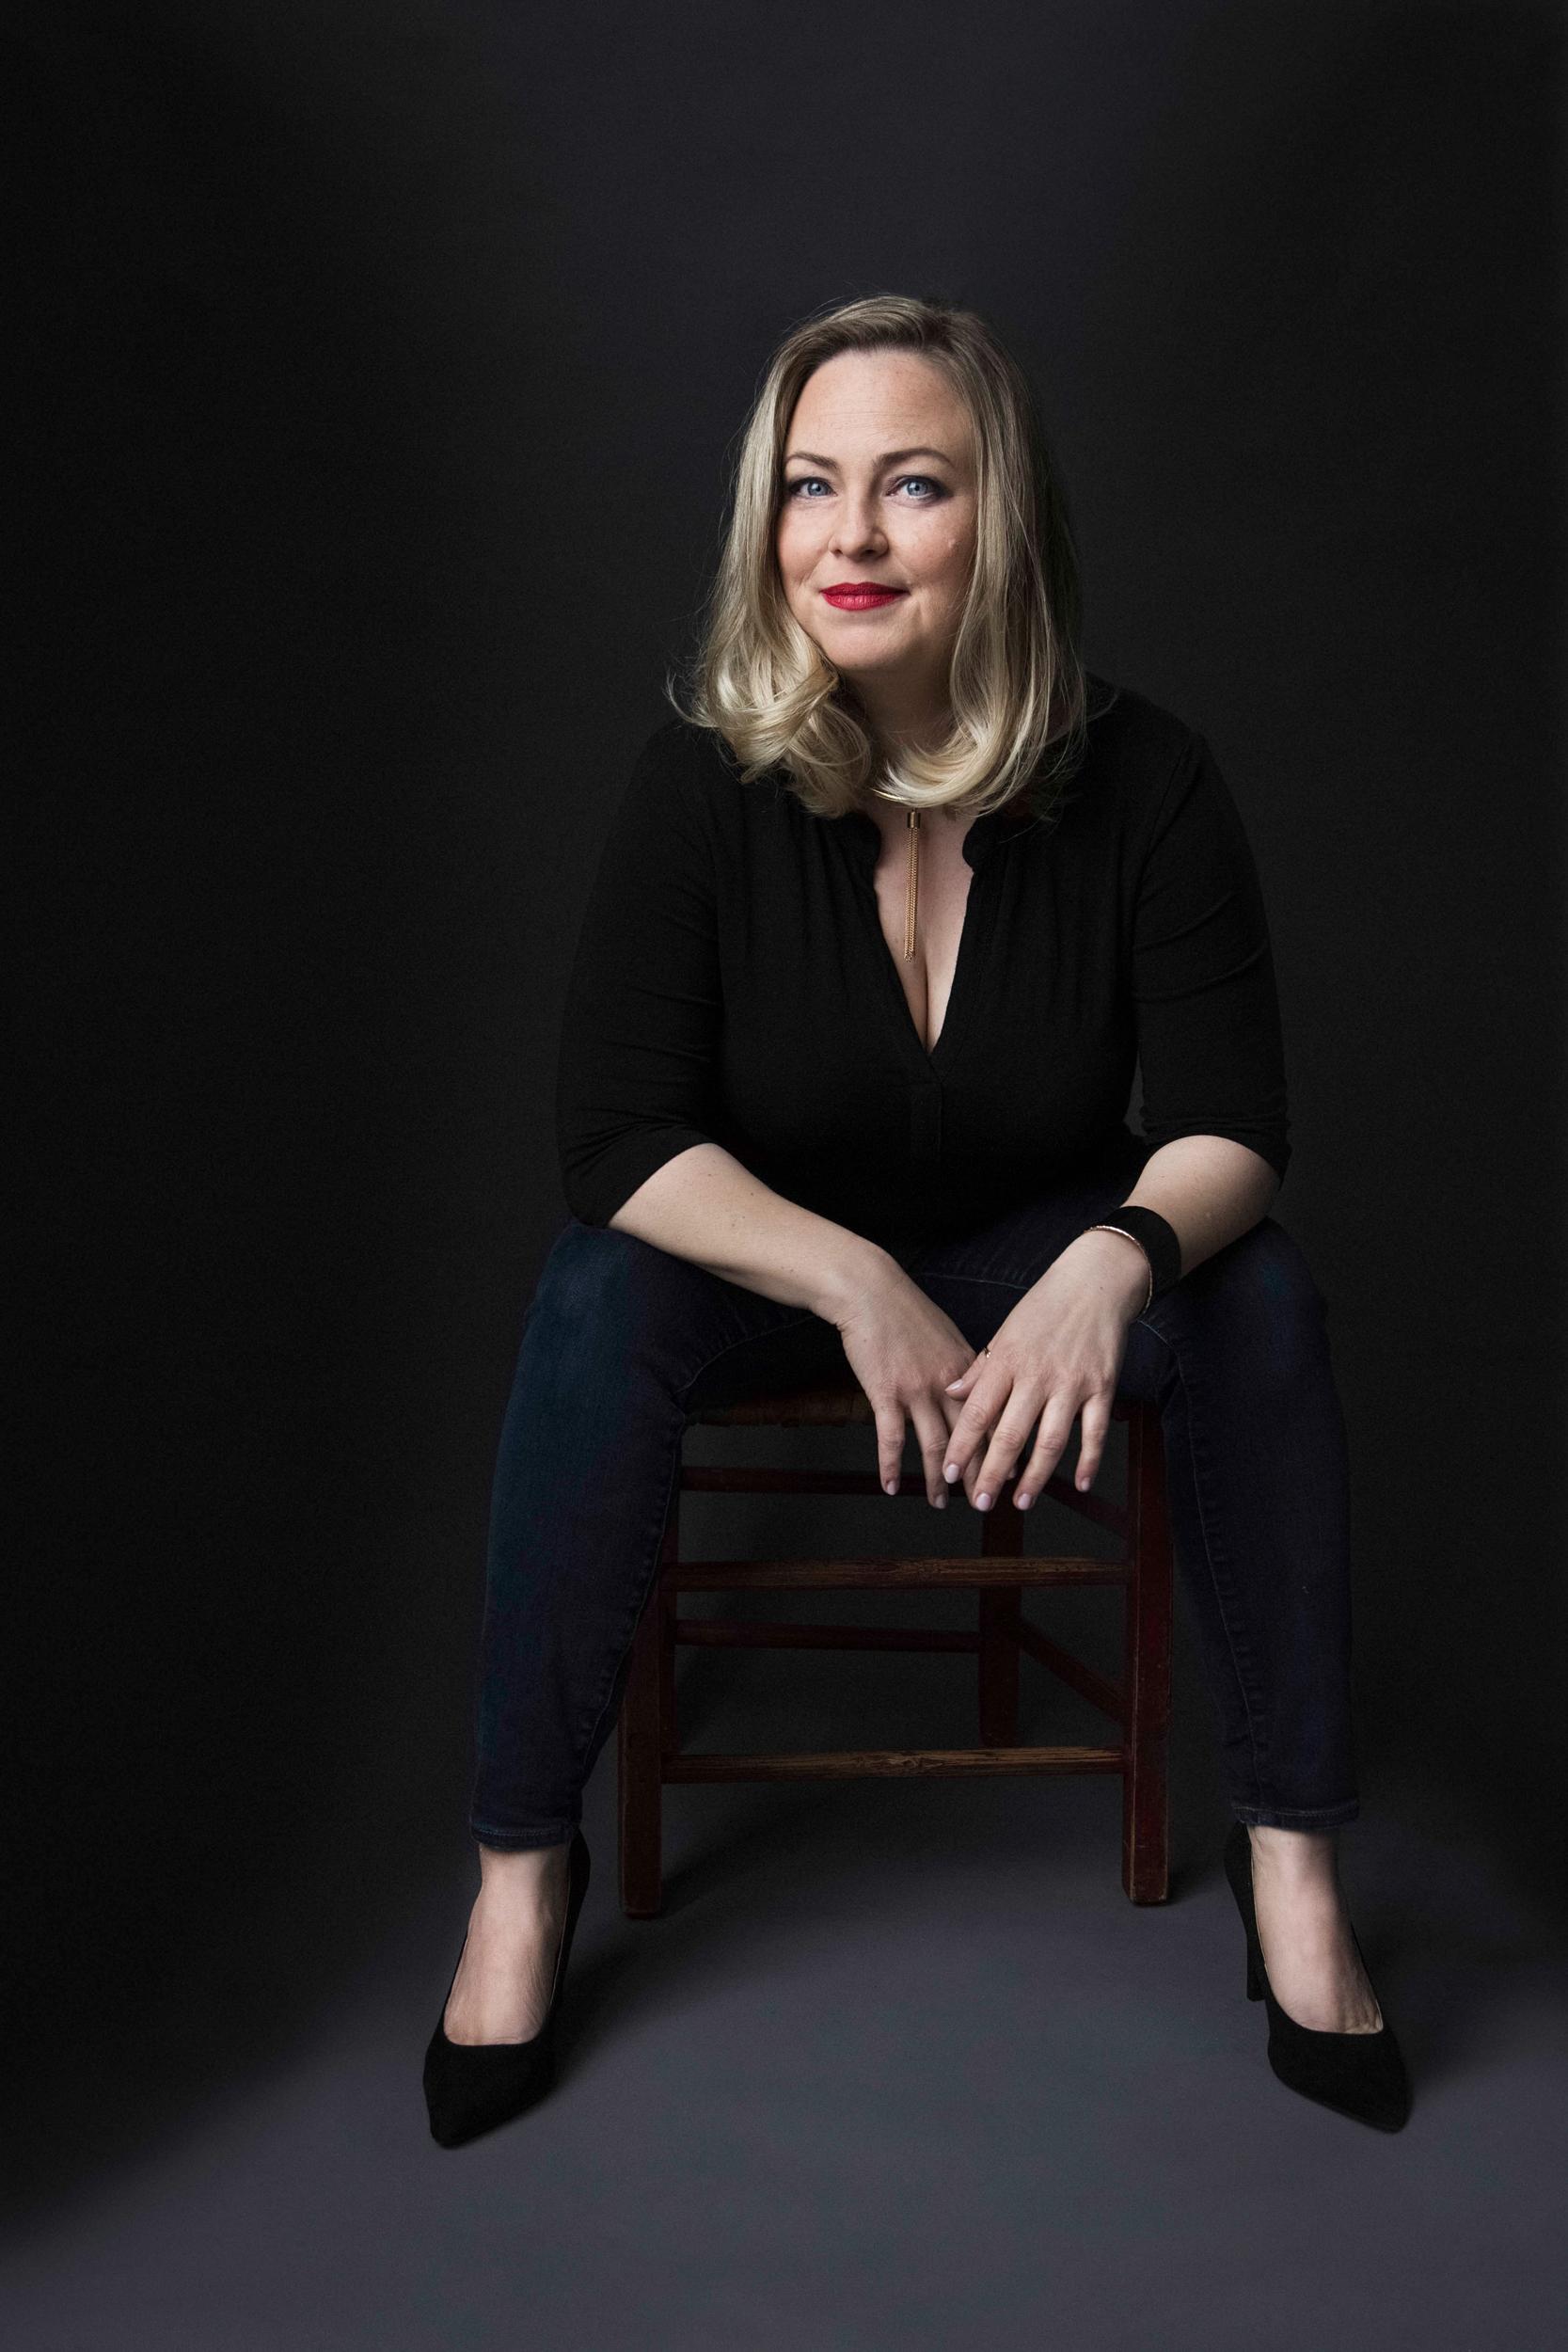 IGINA Headshots Amsterdam Genevieve Chasse Photographer Fotograf Portrait portret 3.jpg